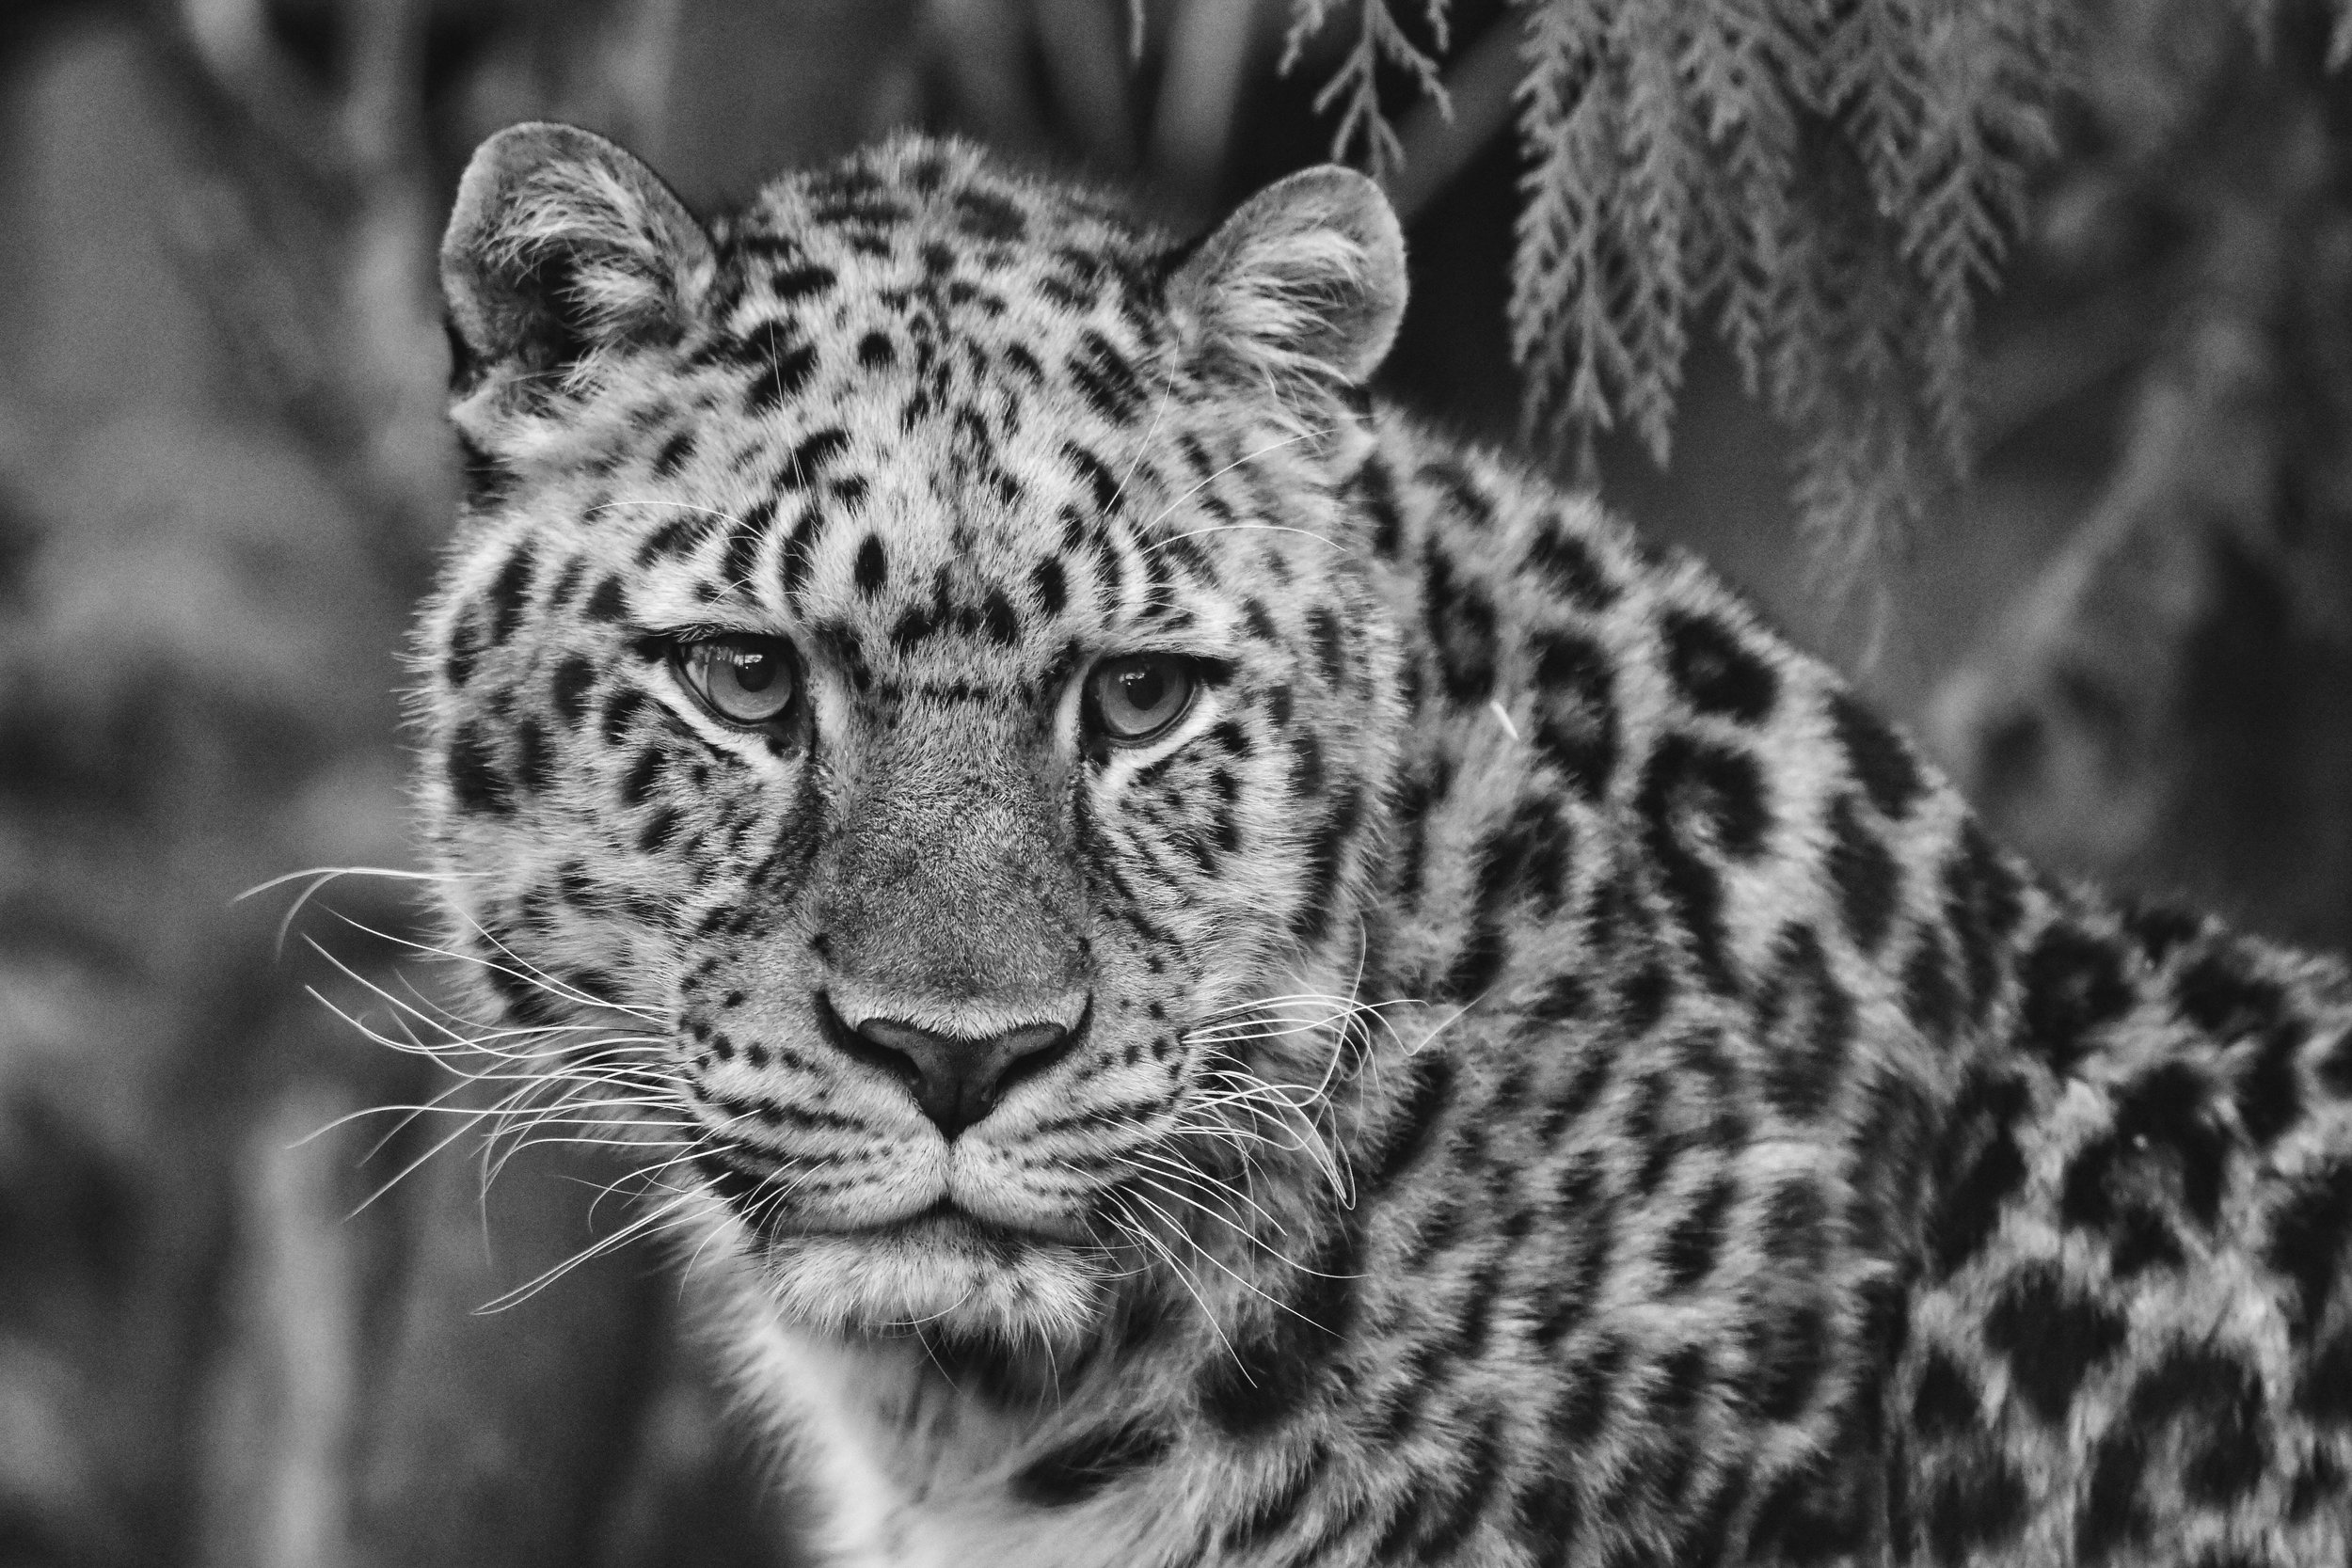 Amur Leopard at the Oregon Zoo